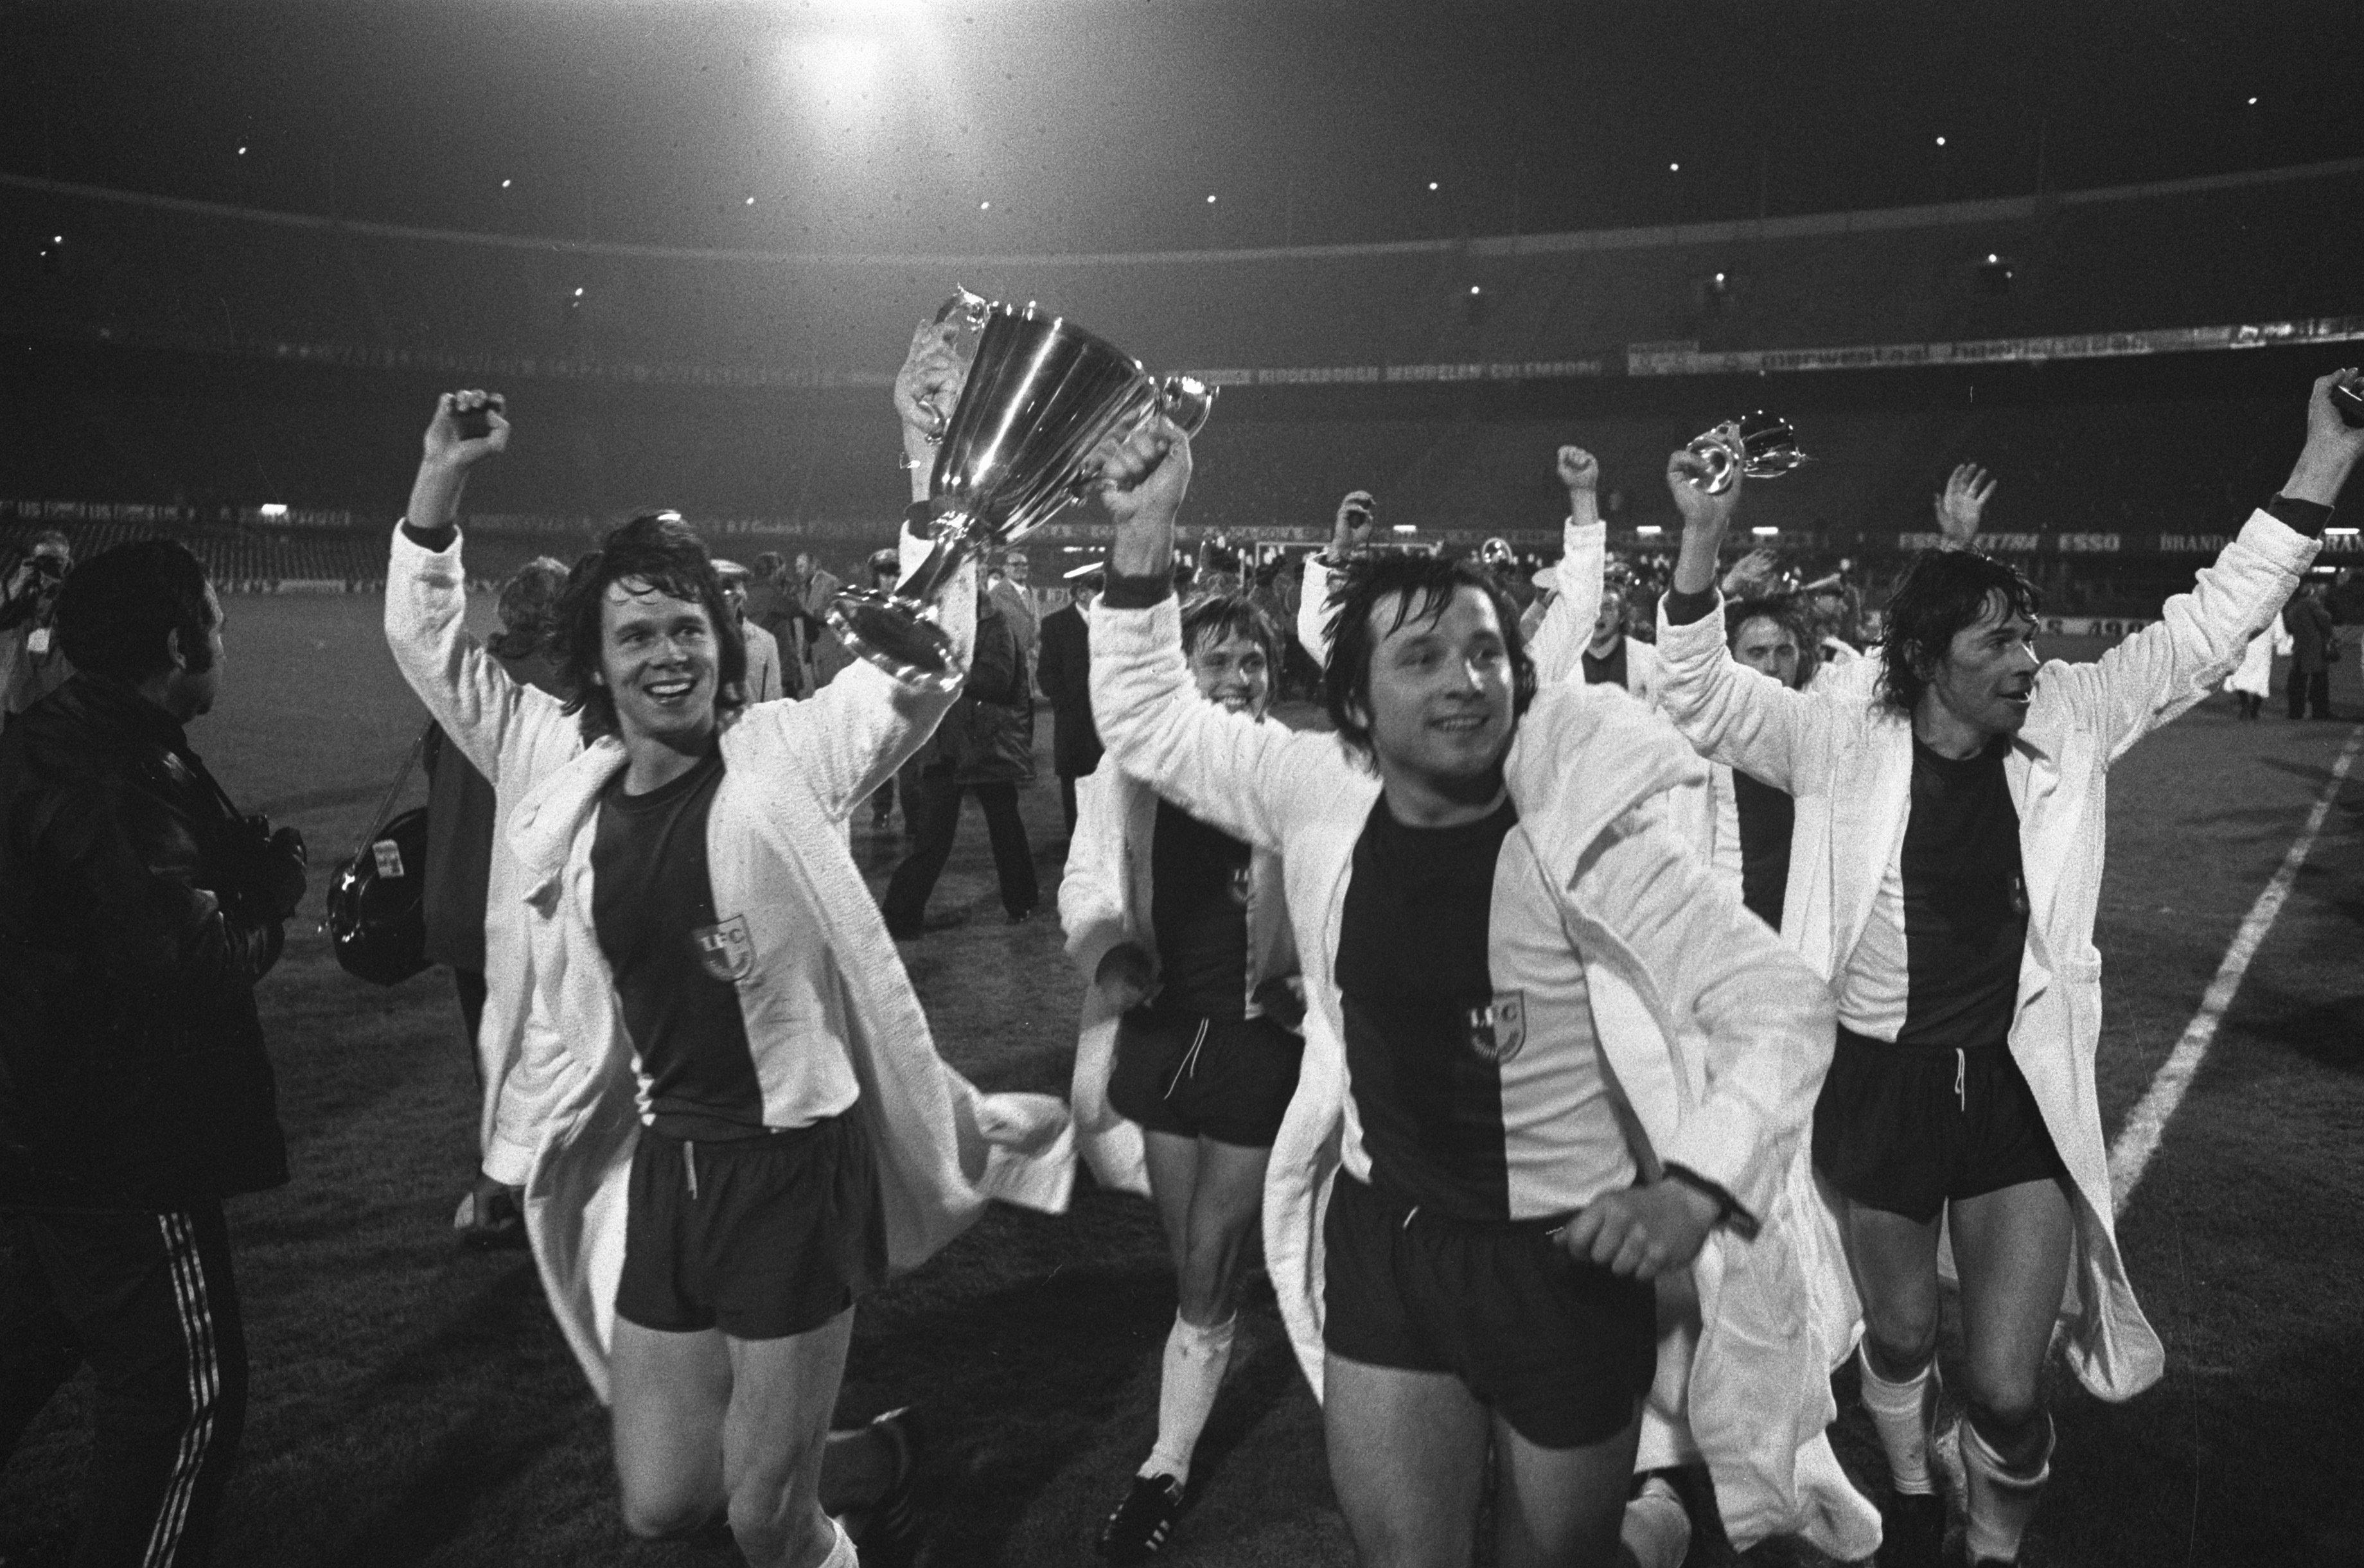 https://upload.wikimedia.org/wikipedia/commons/5/55/AC_Milan_tegen_FC_Magdeburg_0-2%2C_finale_Europacup_II_spelers_met_beker%2C_Bestanddeelnr_927-1797.jpg